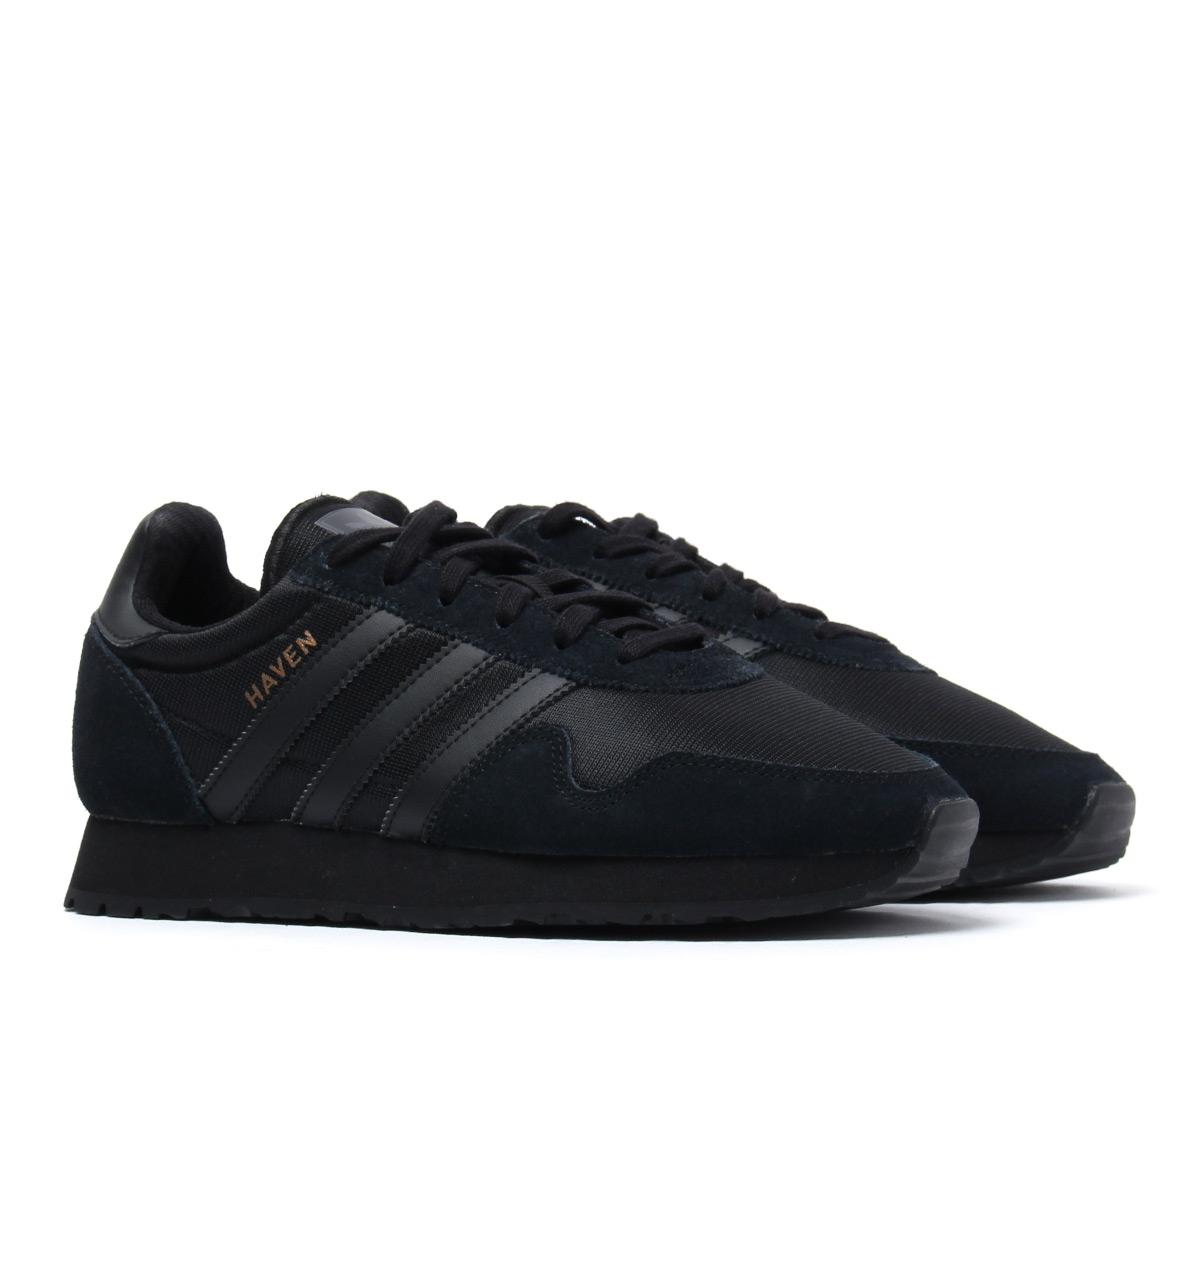 Lyst - adidas Originals Black Haven Trainers in Black for Men ae93ef615